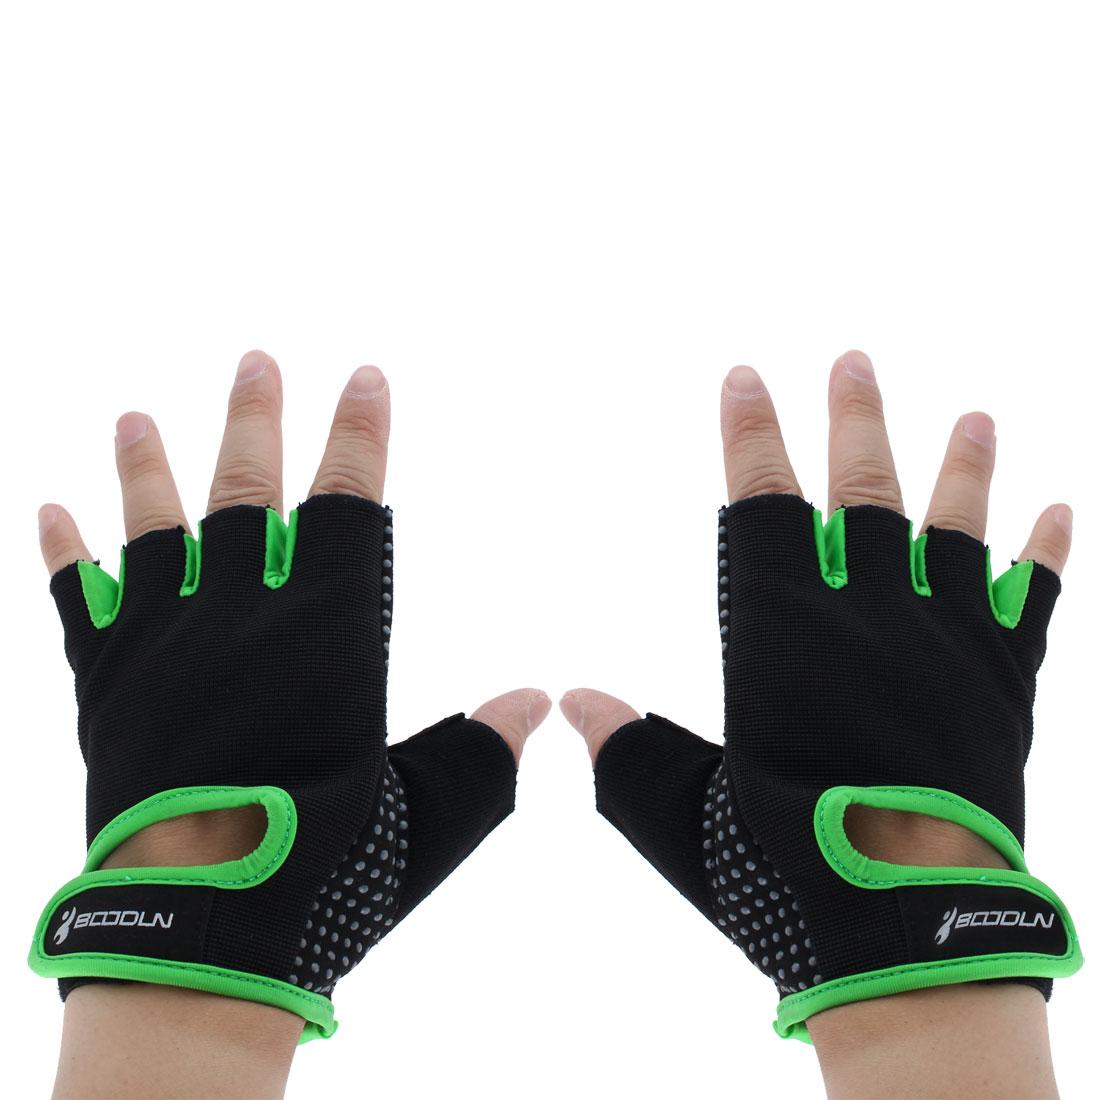 BOODUN Authorized Exercise Weight Biking Lifting Training Microfiber Non-slip Fitness Half Finger Gloves Green M